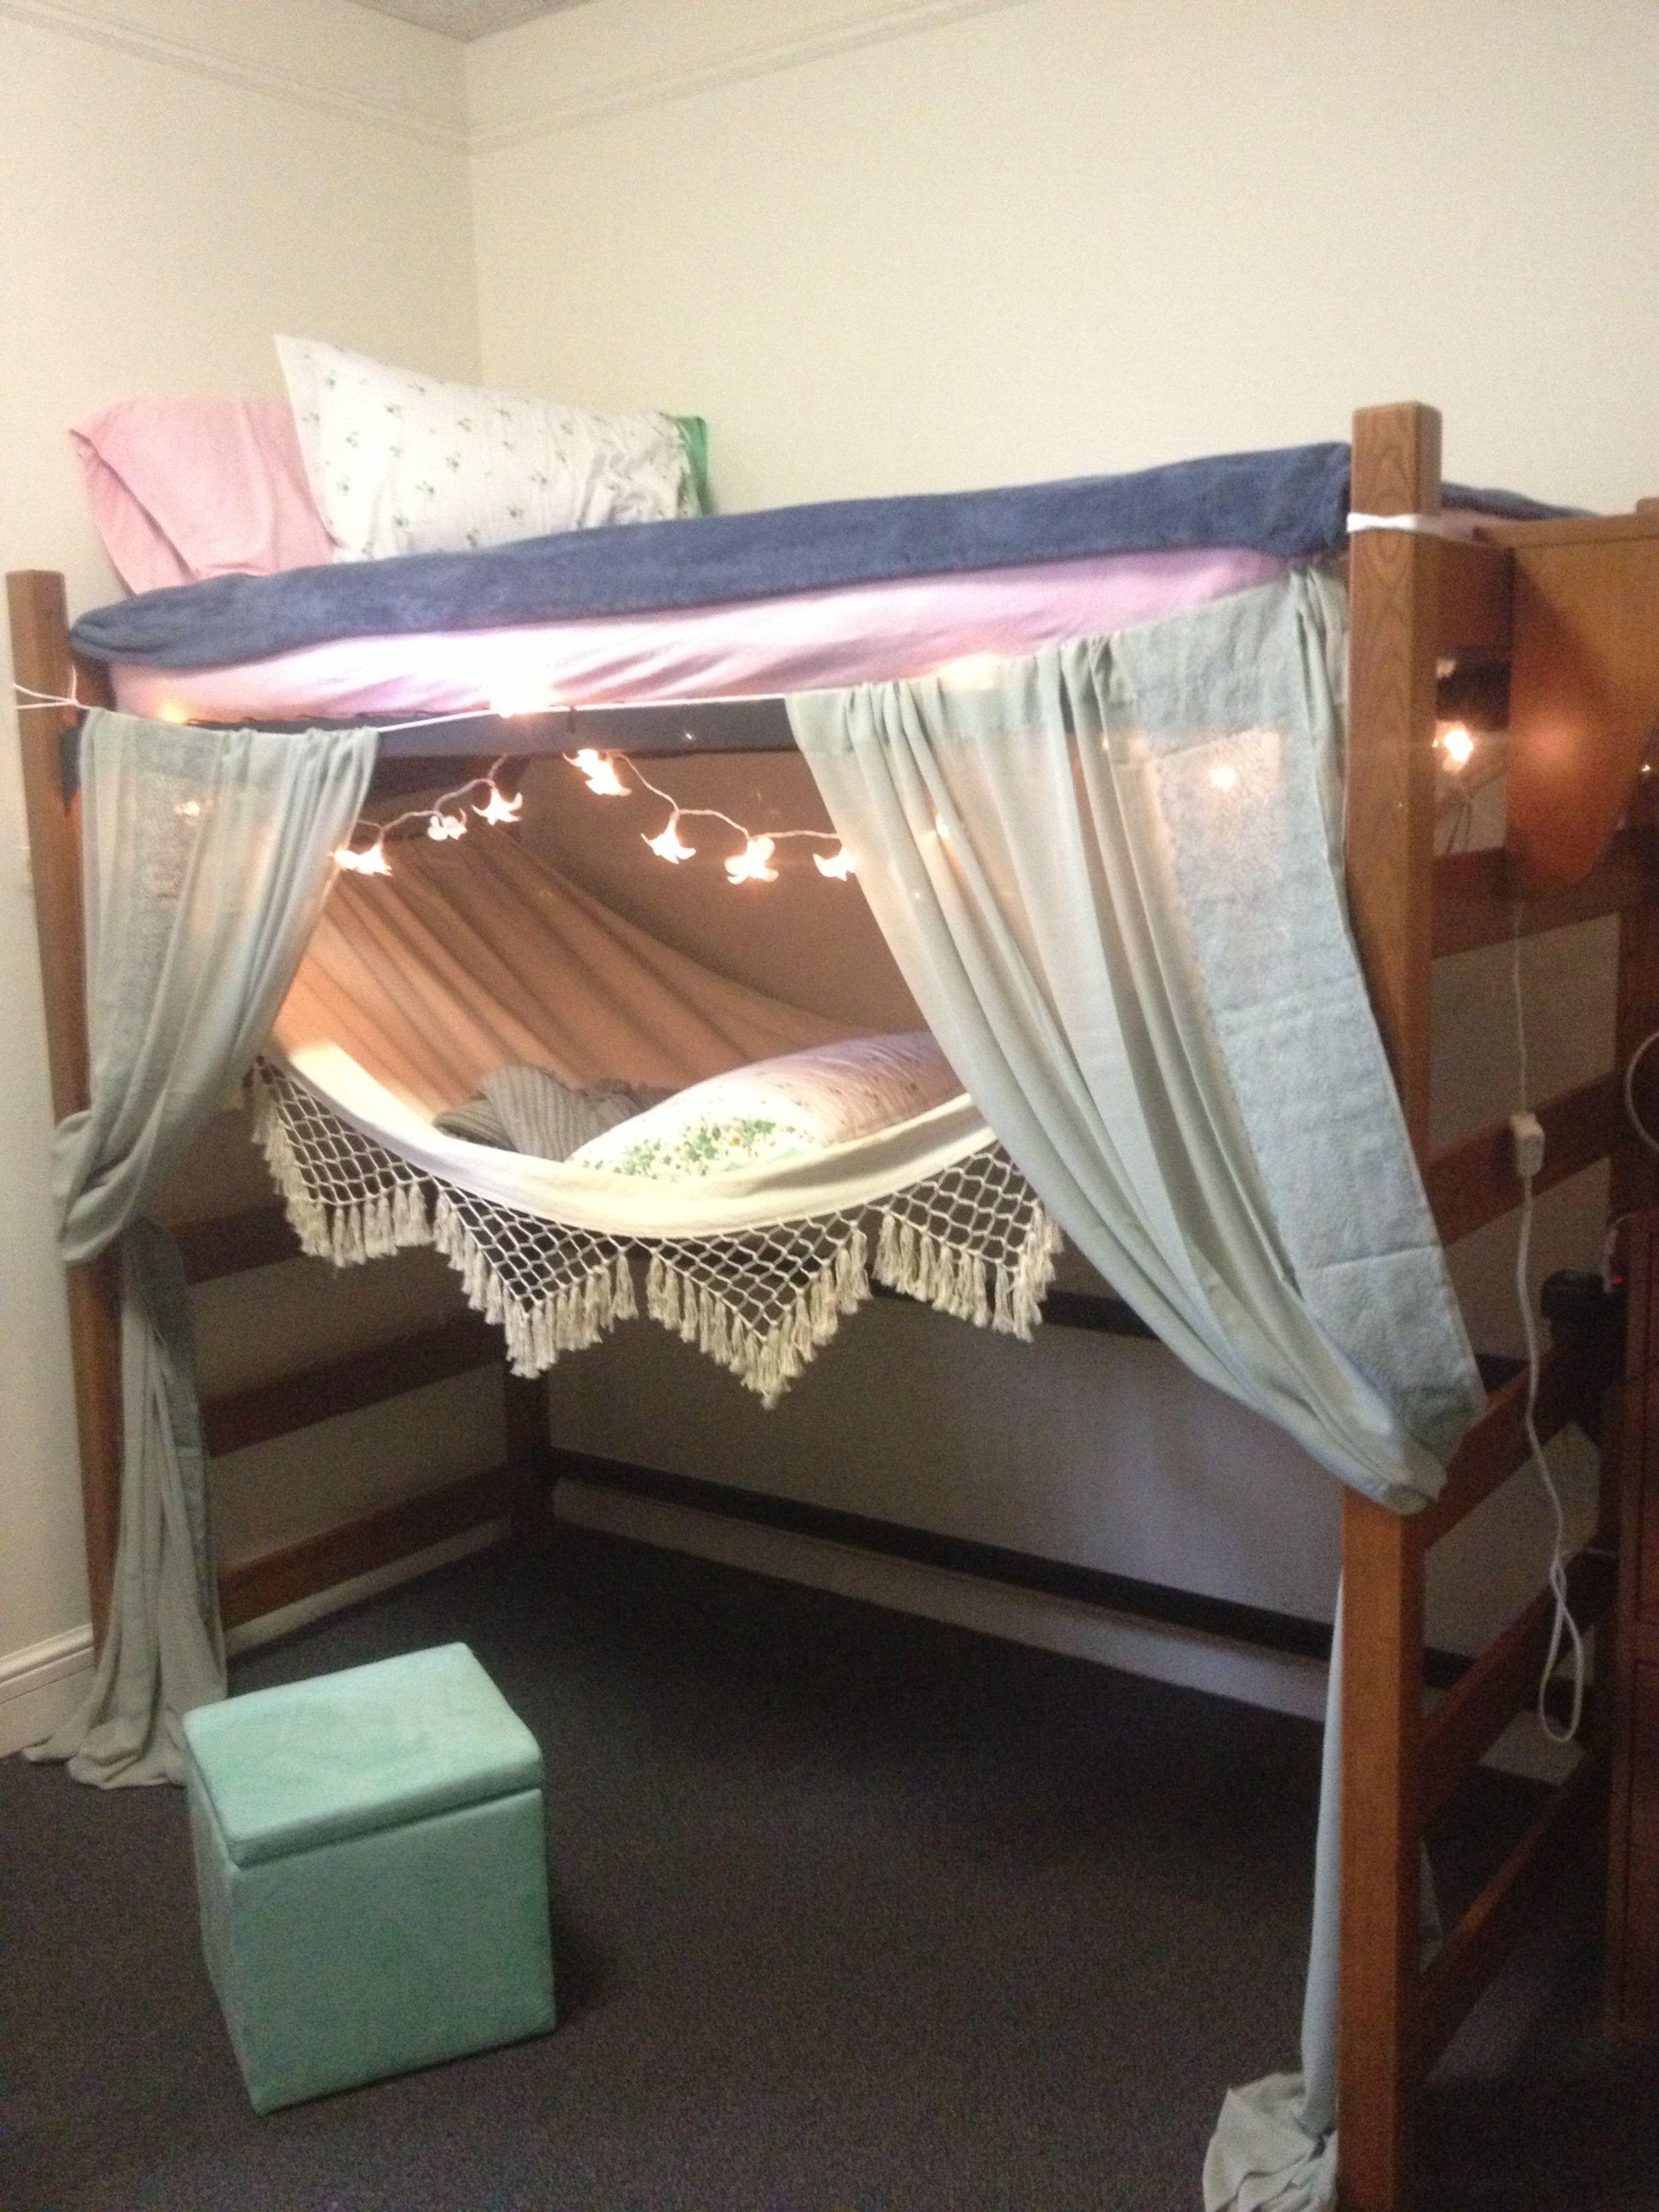 Loft bed ideas for dorm room  Dorm room lofted bed and hammock  Dorm  Pinterest  Dorm room